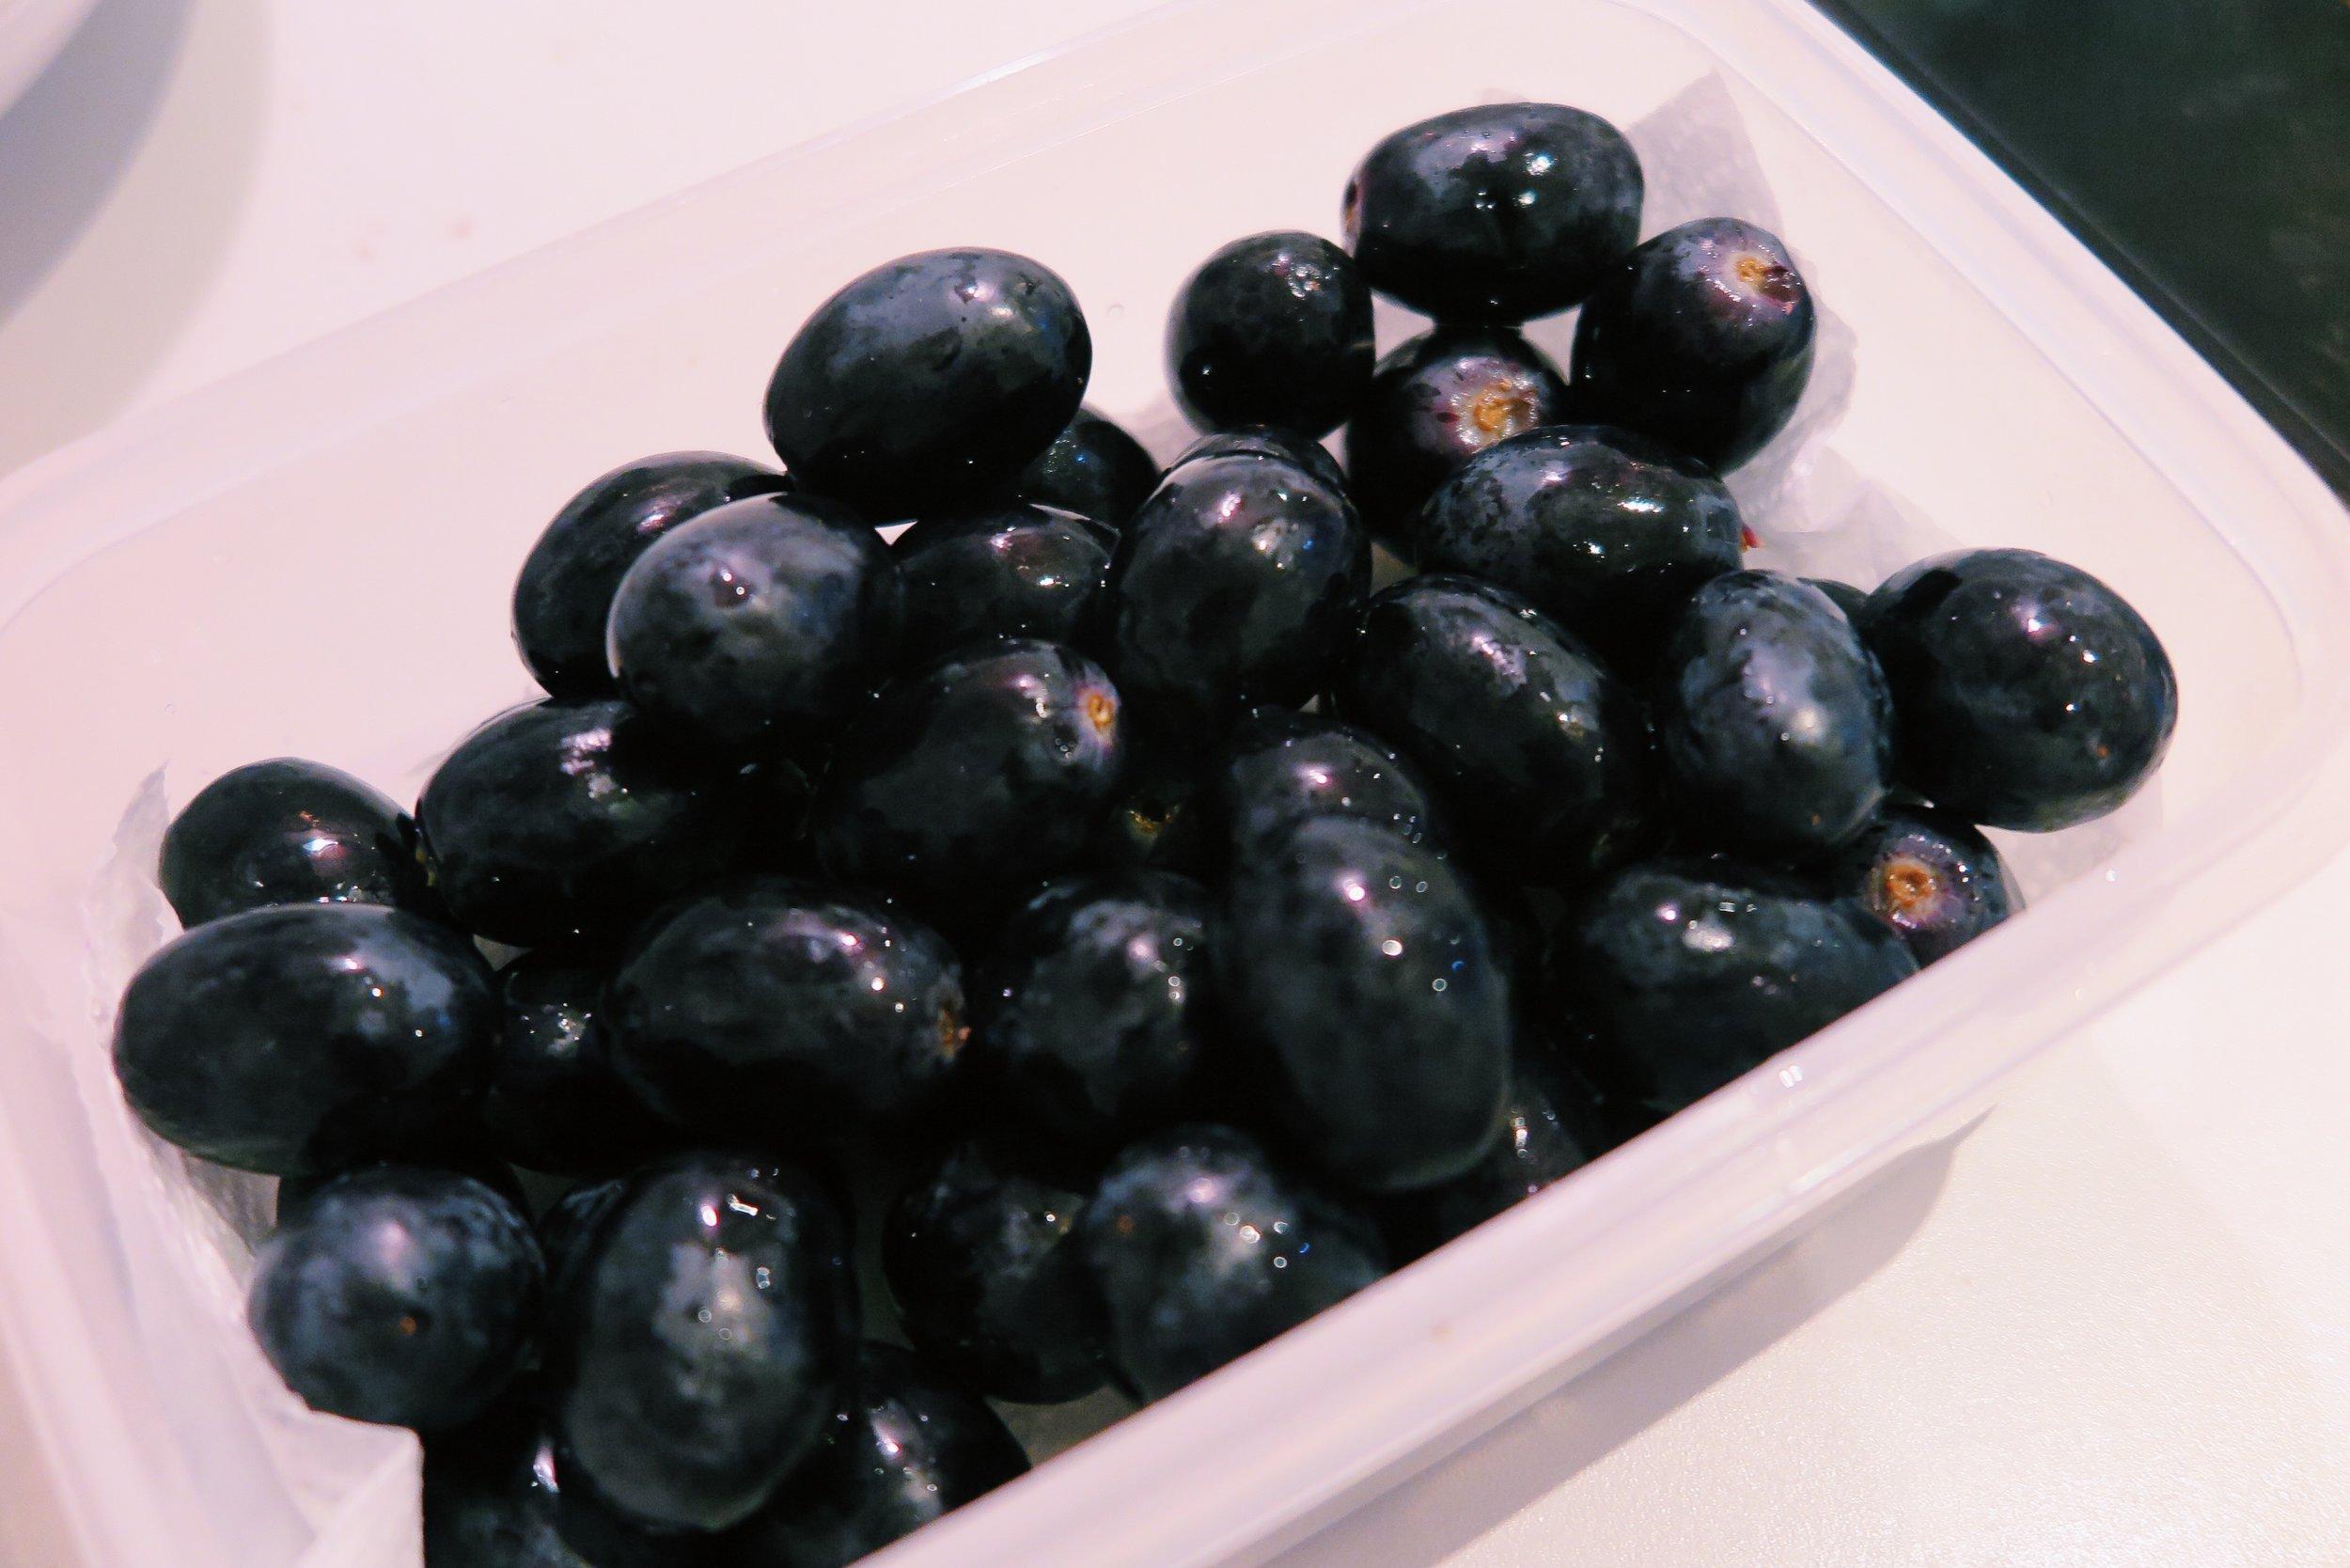 2.  Grapes